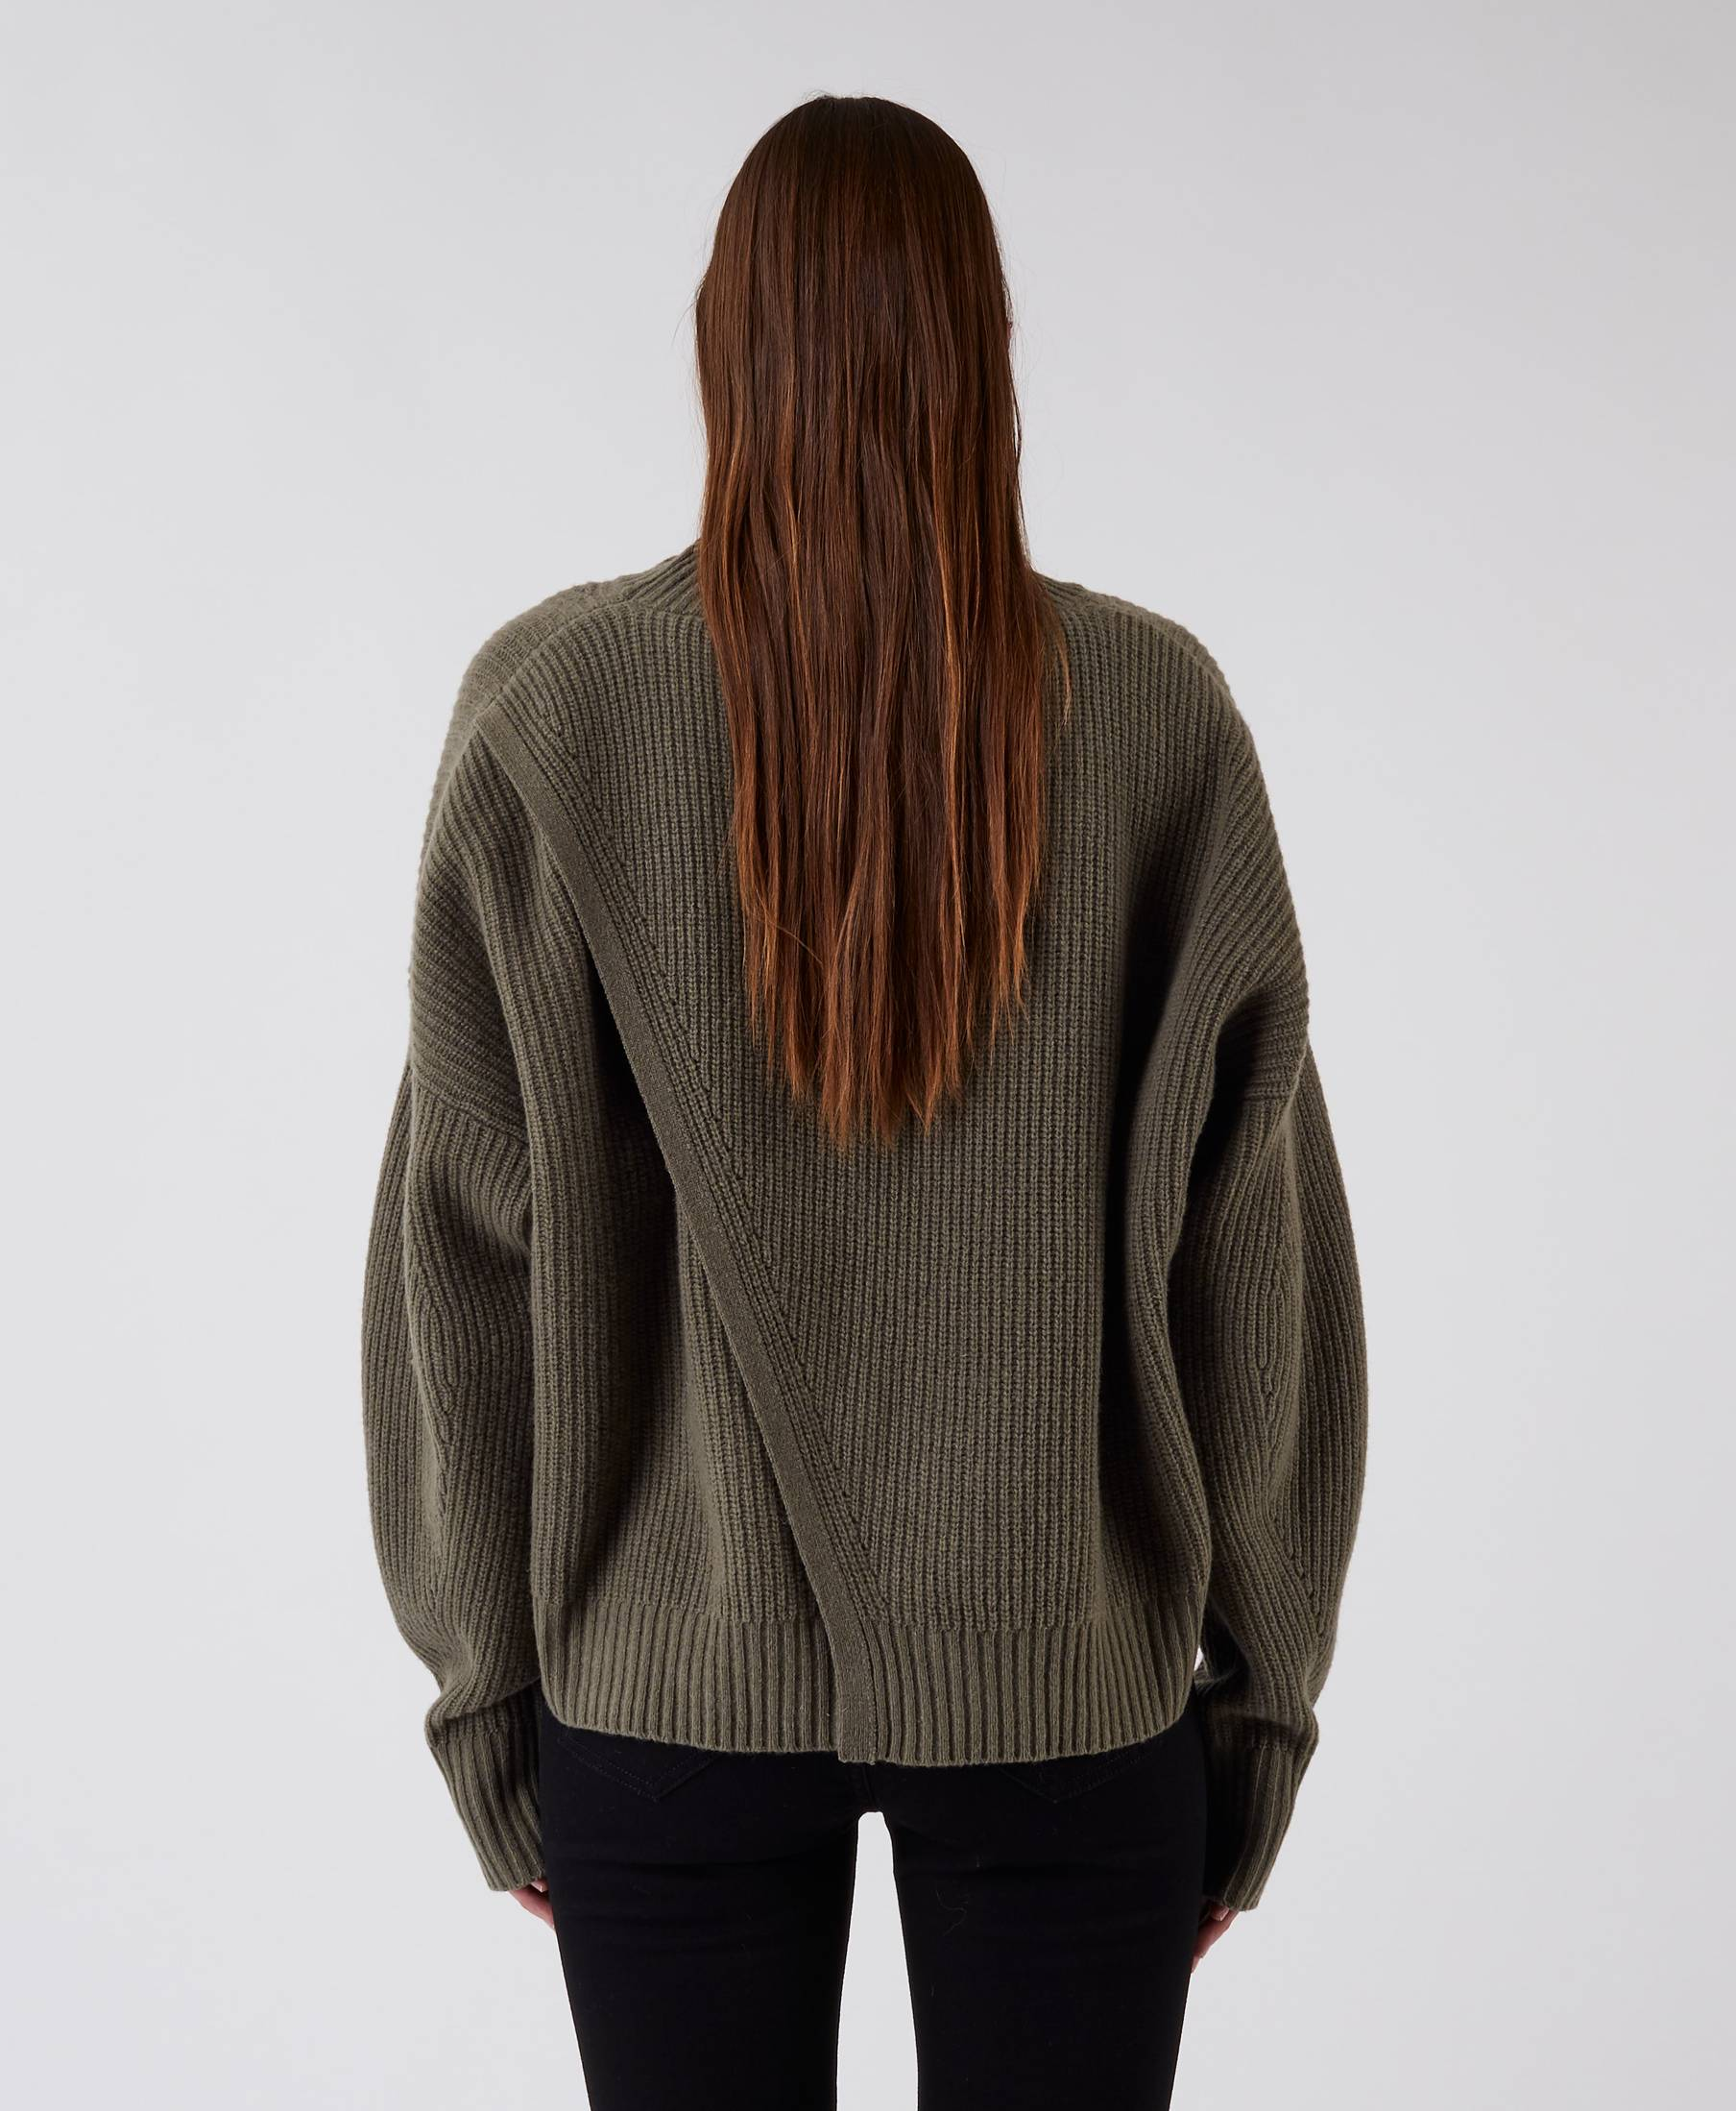 Kara Turtle Sweater Pale Pine